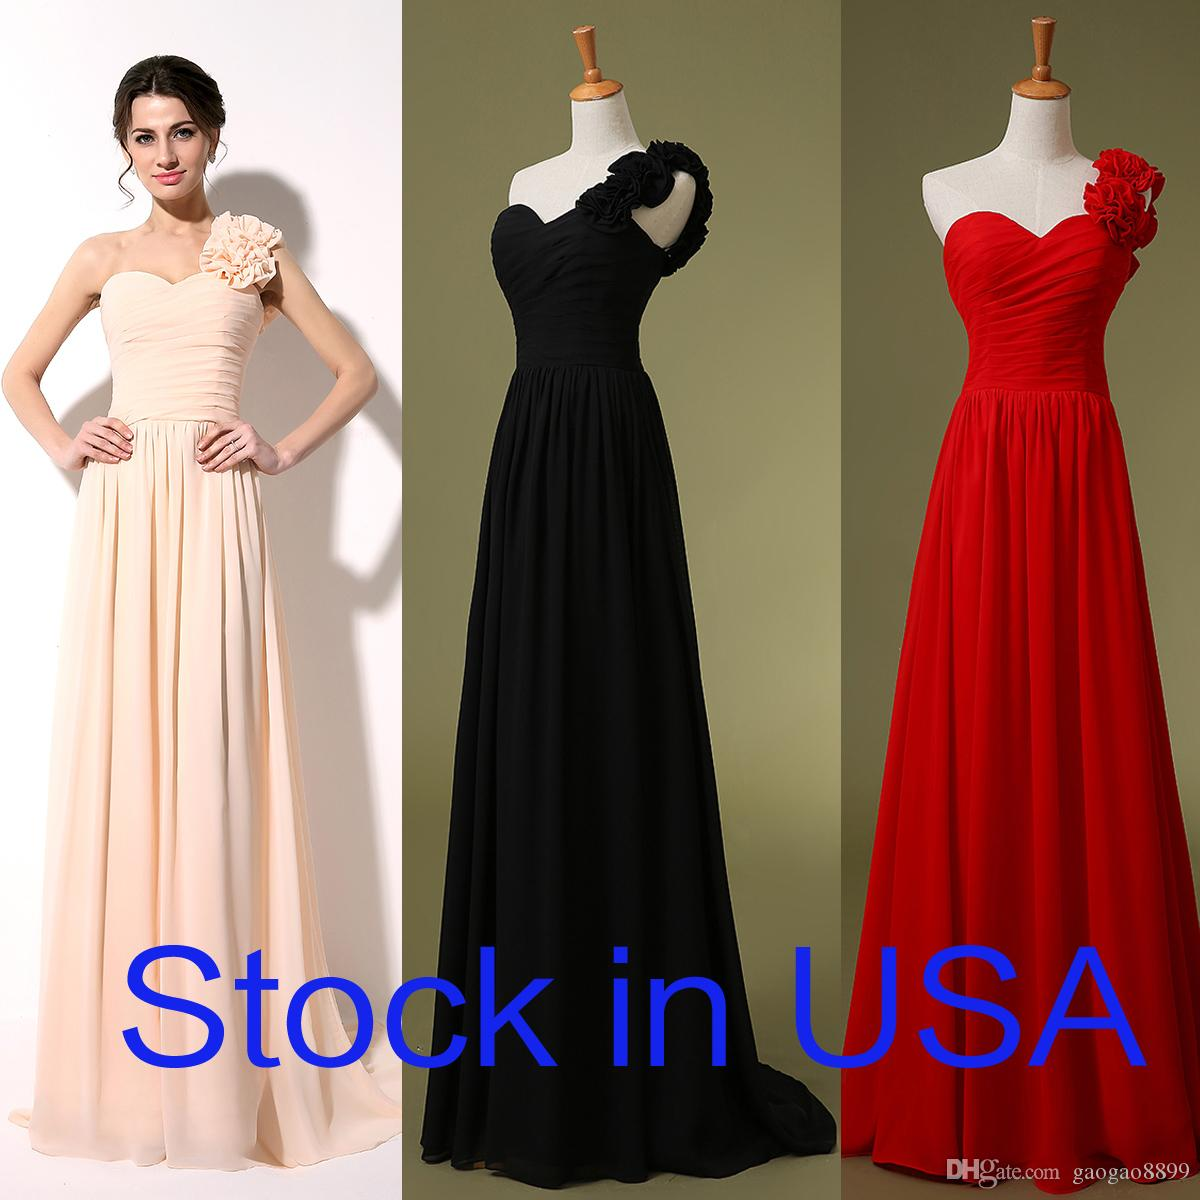 Bridesmaid Dresses Usa Cheap - Overlay Wedding Dresses